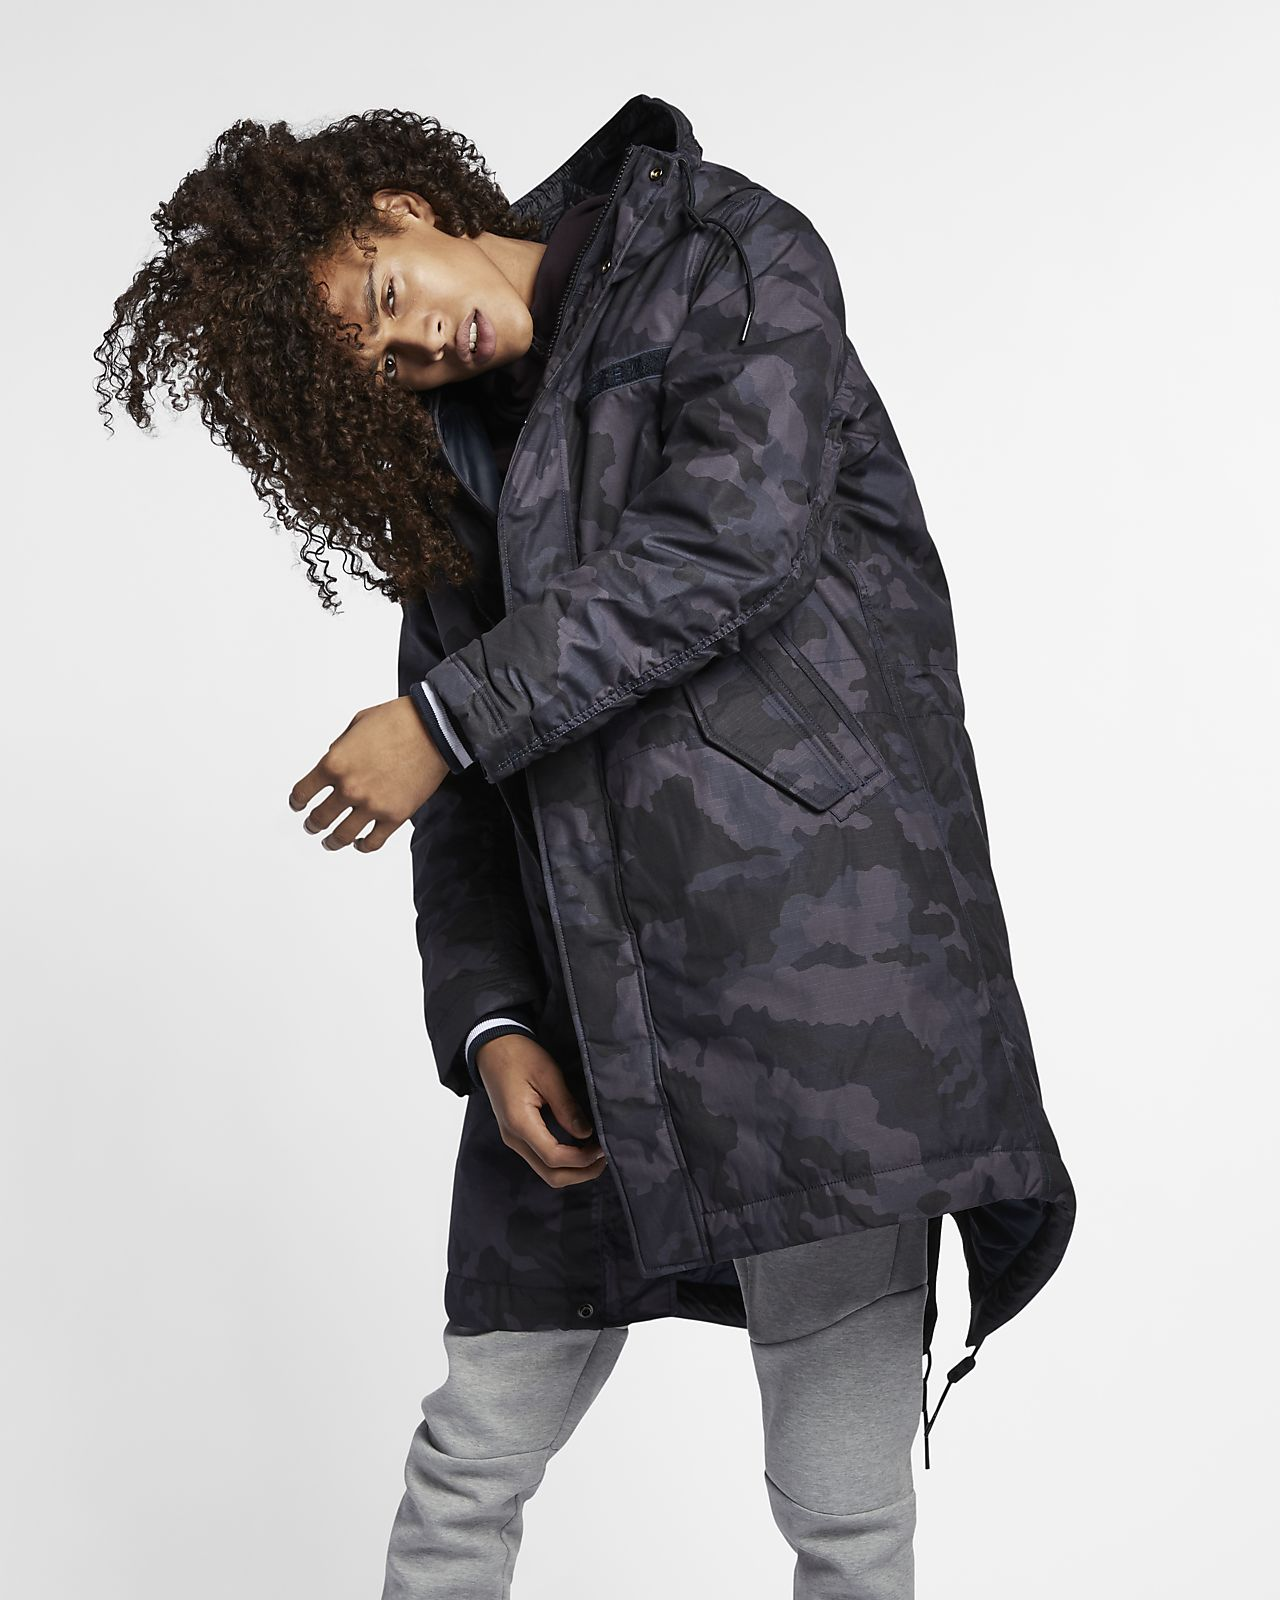 Nike Sportswear NSW Herrenparka mit Synthetikfüllung